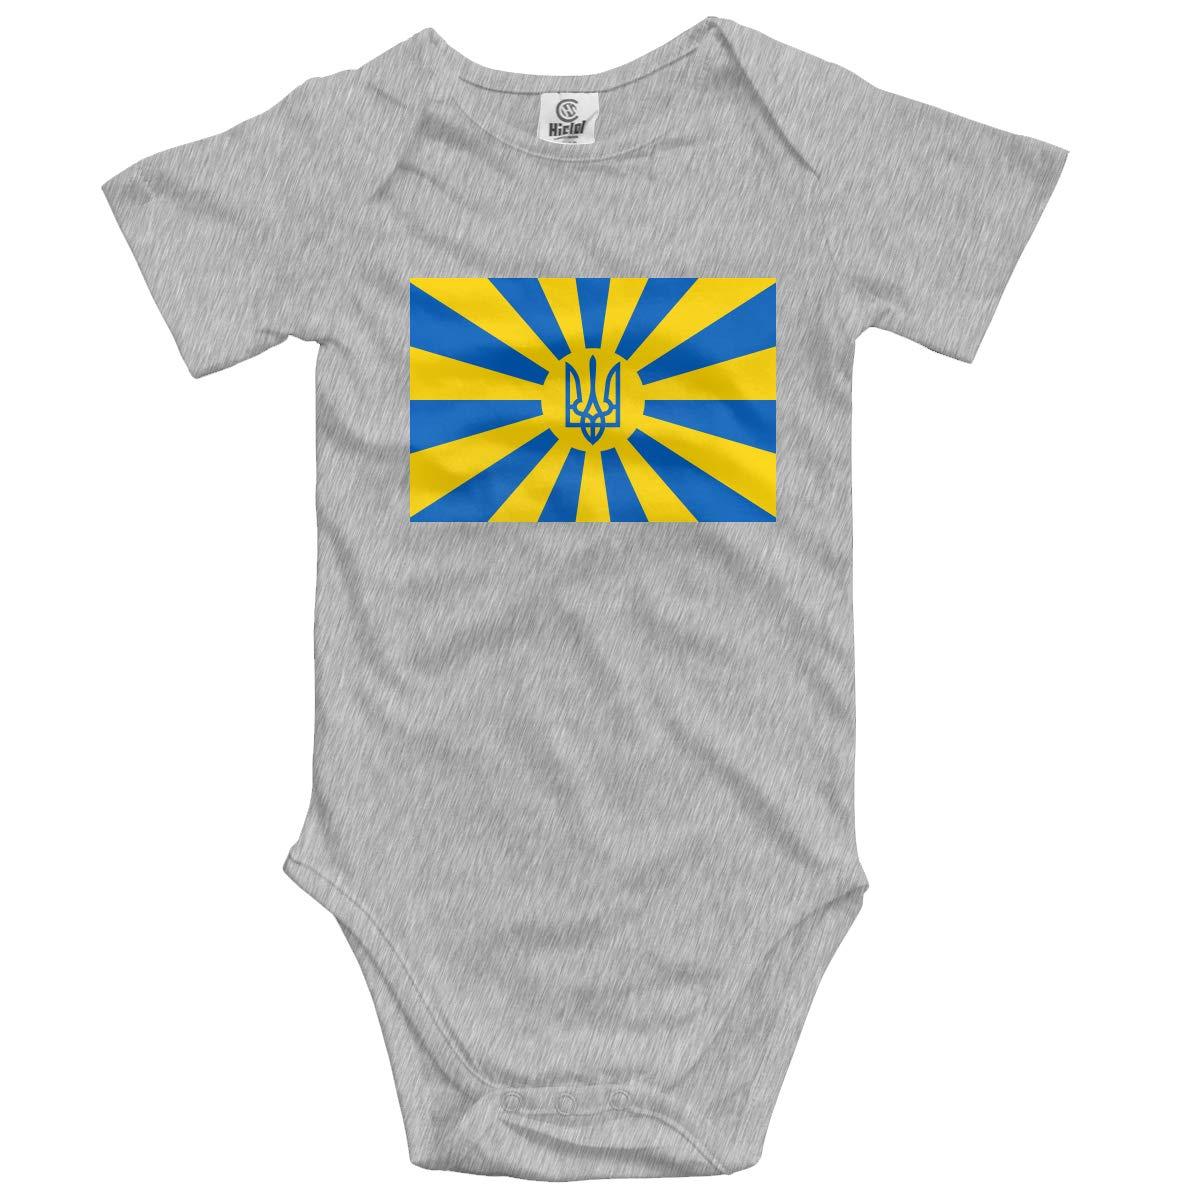 CUTEDWARF Baby Short-Sleeve Onesies Ukrainian Bodysuit Baby Outfits